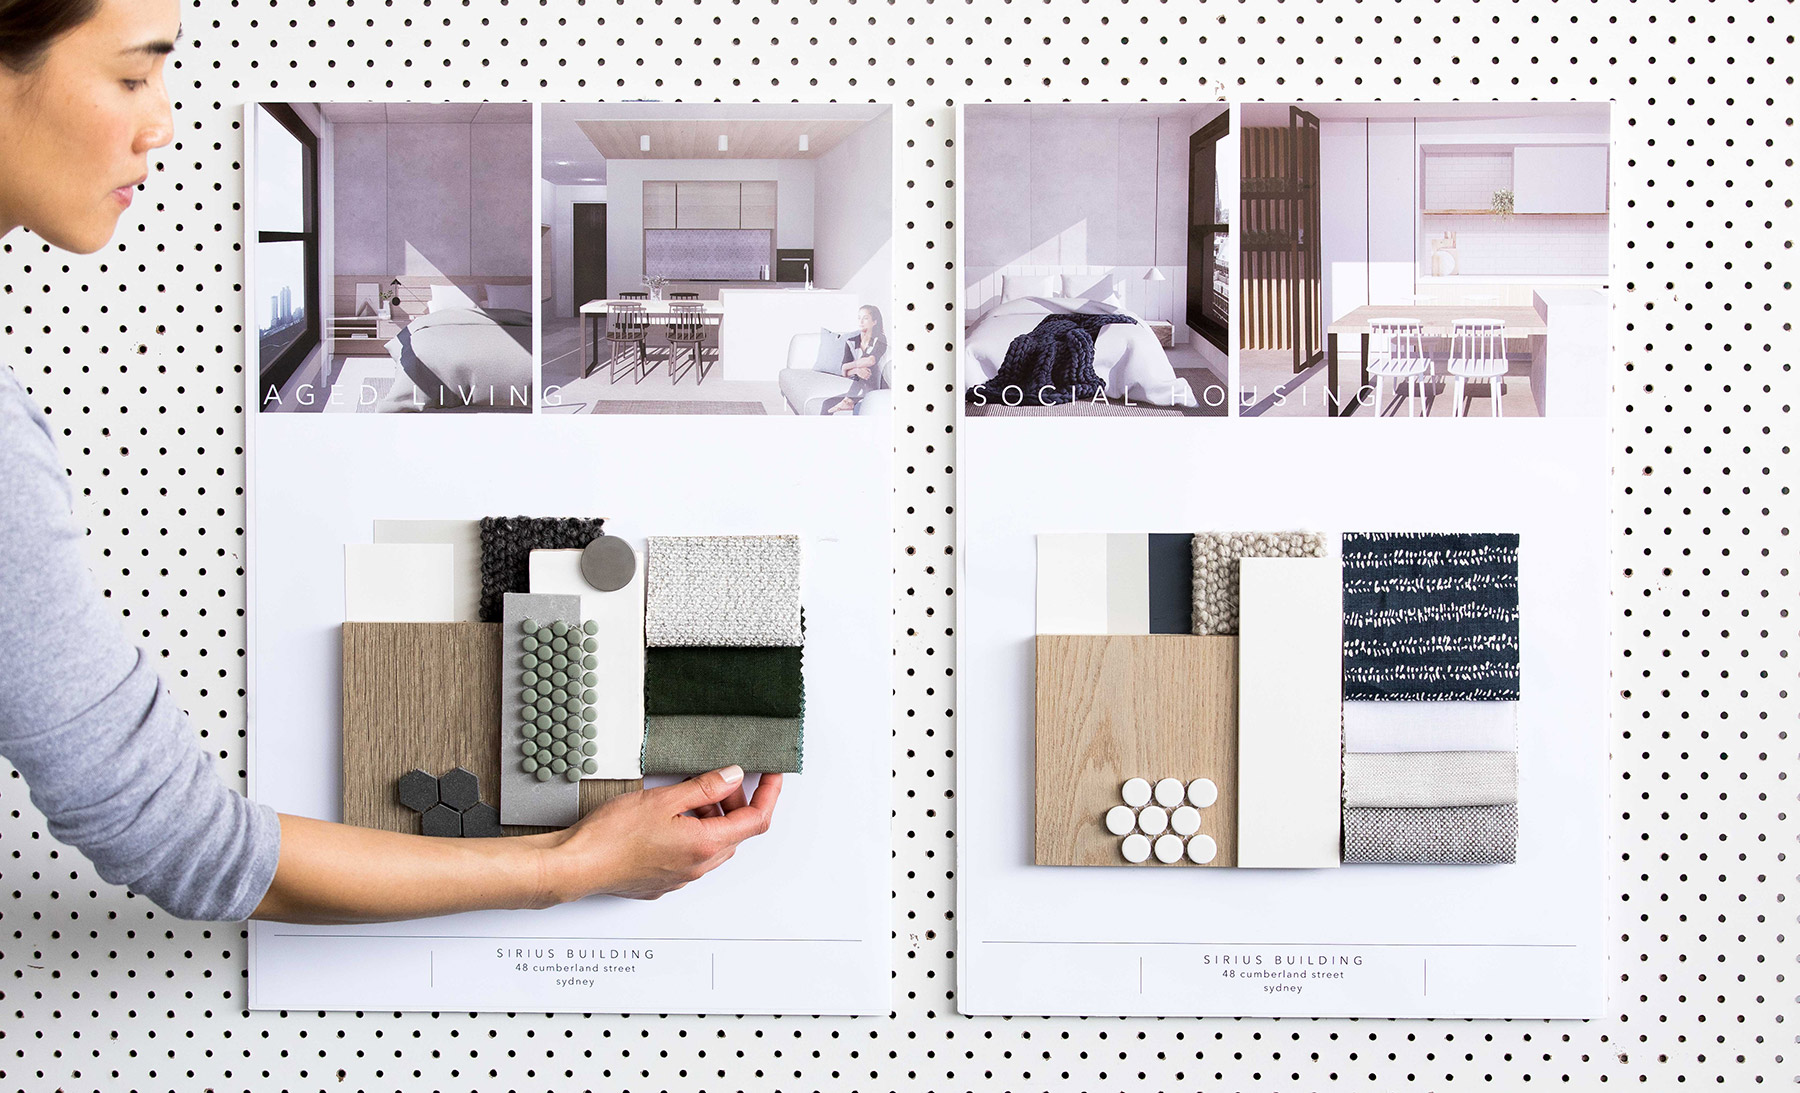 Advanced Diploma of Interior Design, Sydney Design School. Student work - Kelsie Sibley